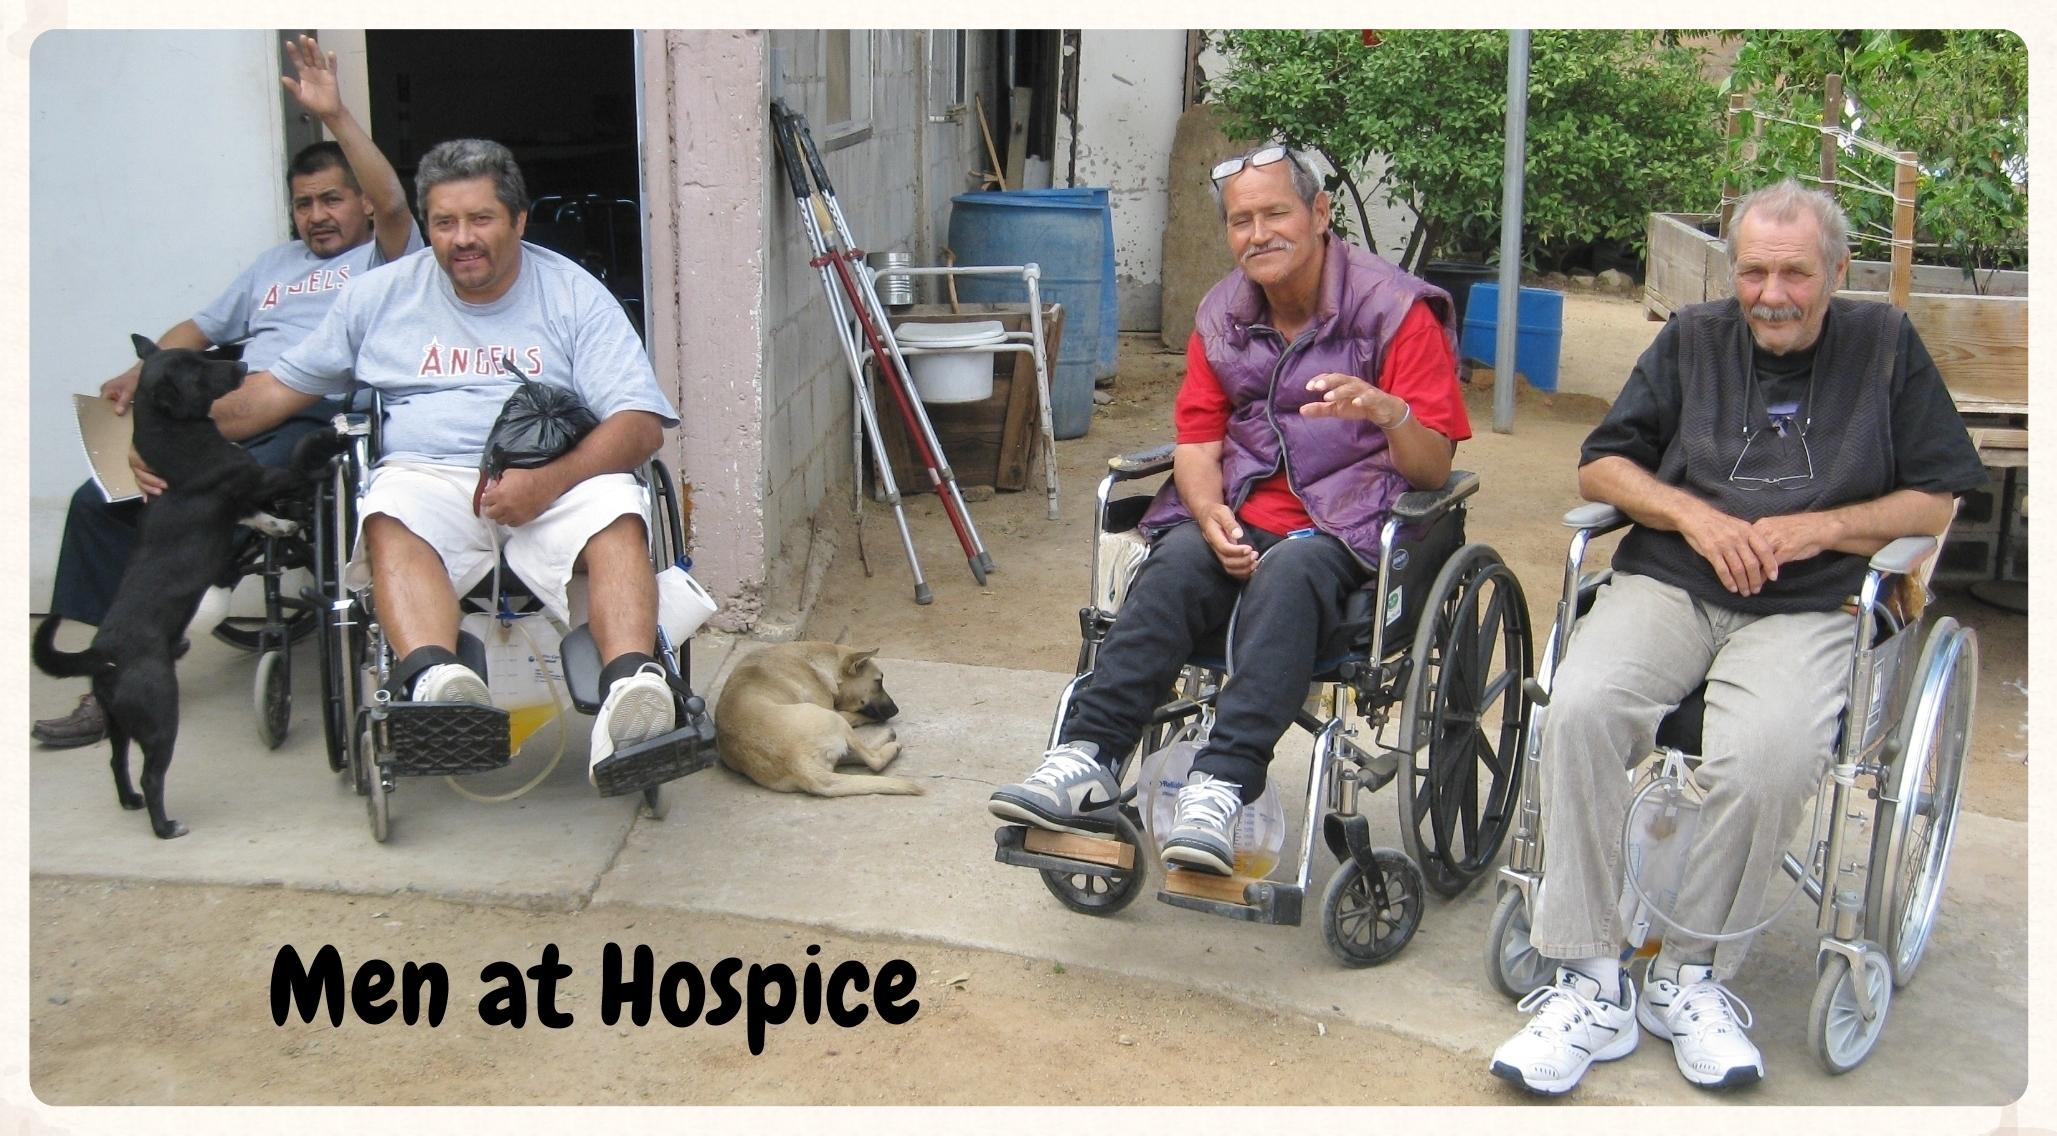 HospiceRoof 018.JPG